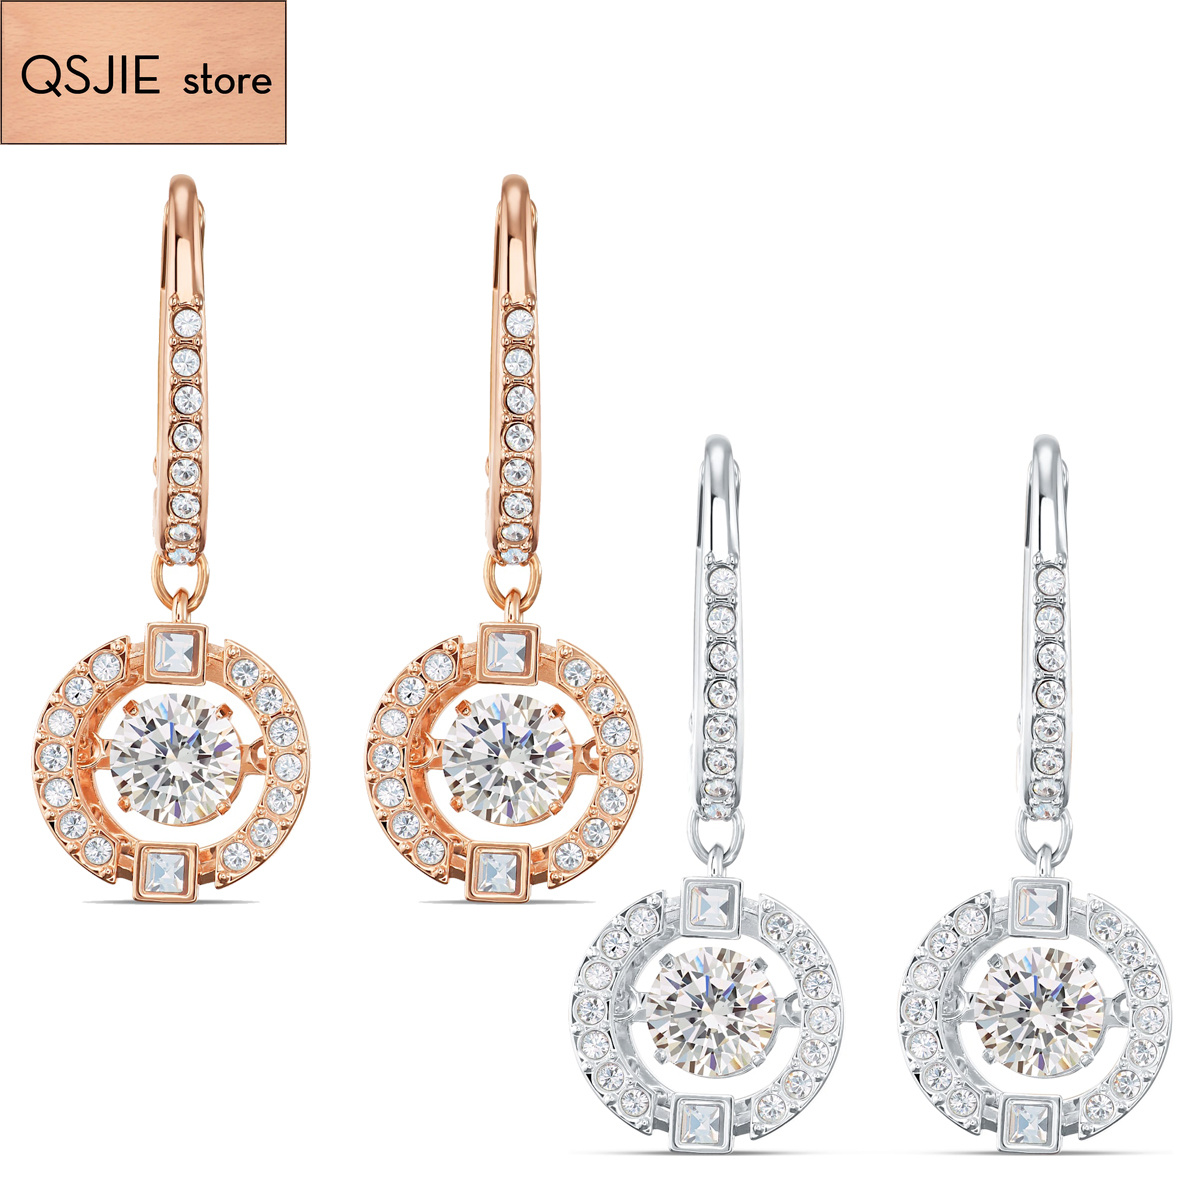 QSJIE High quality SWA new style. A nimble and charming Earring Glamorous fashion jewelry